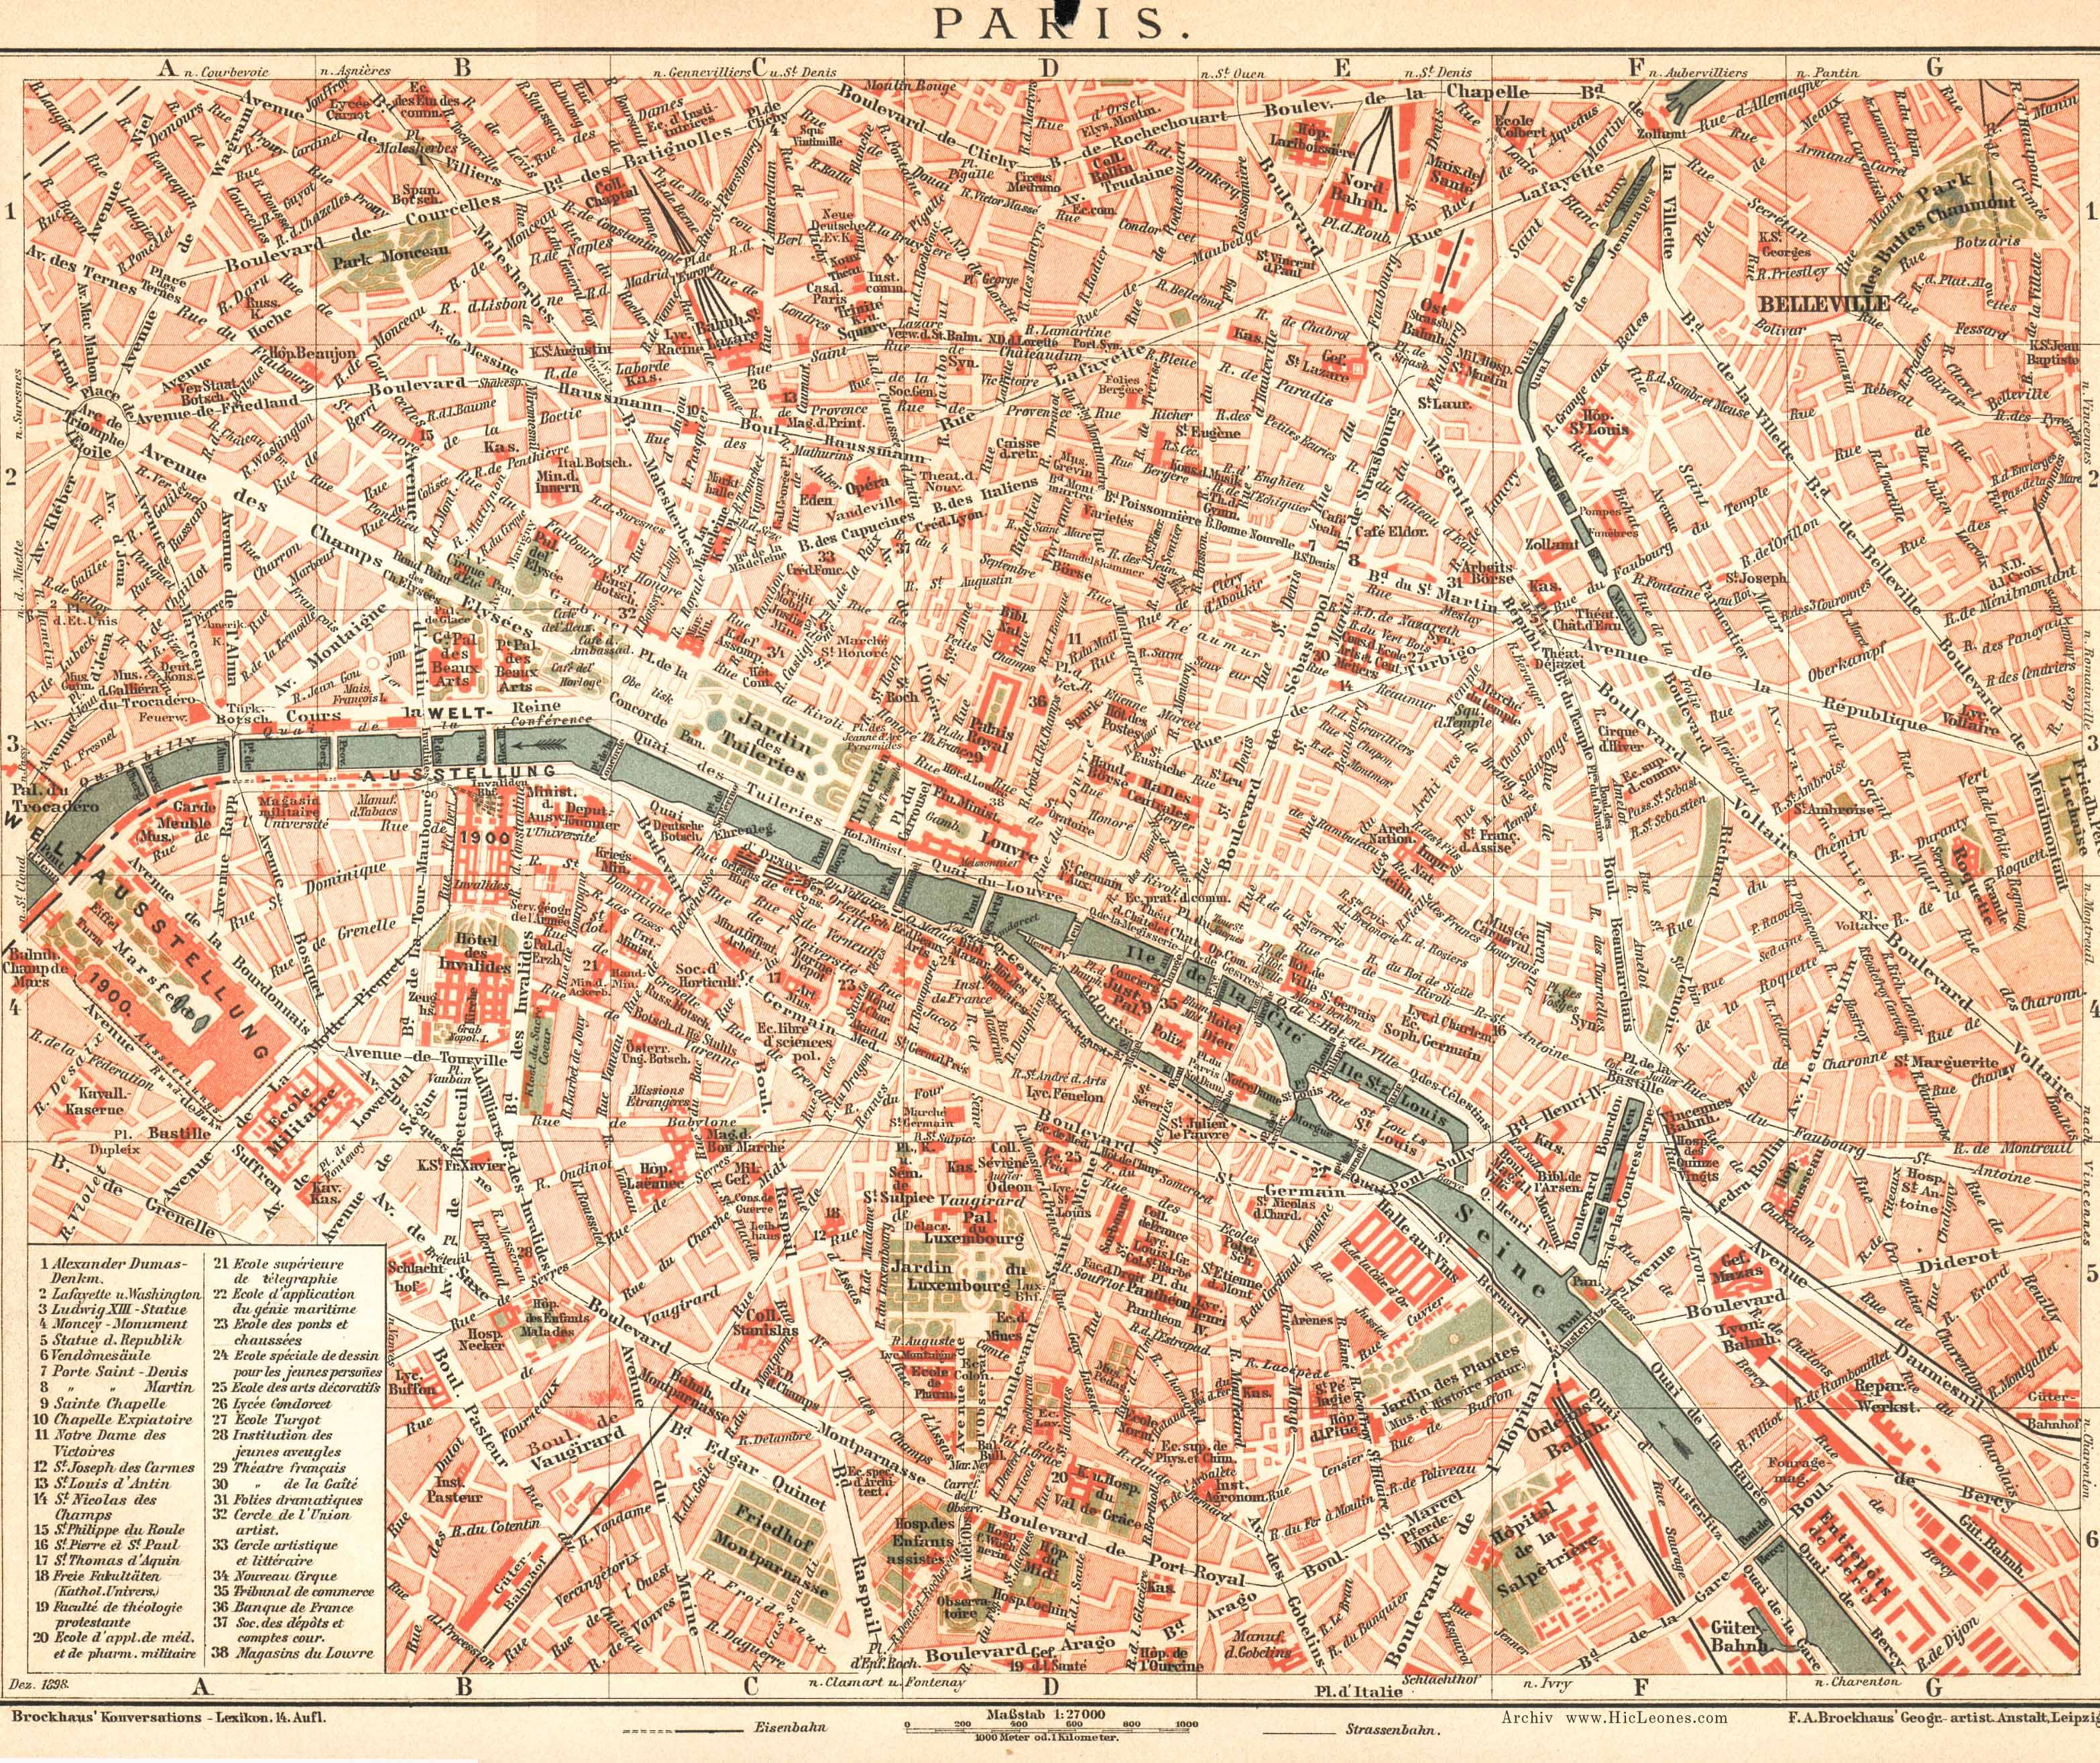 Paris Street Map 1880 1898 Vintage Paris Map Paris Map Paris Street Map